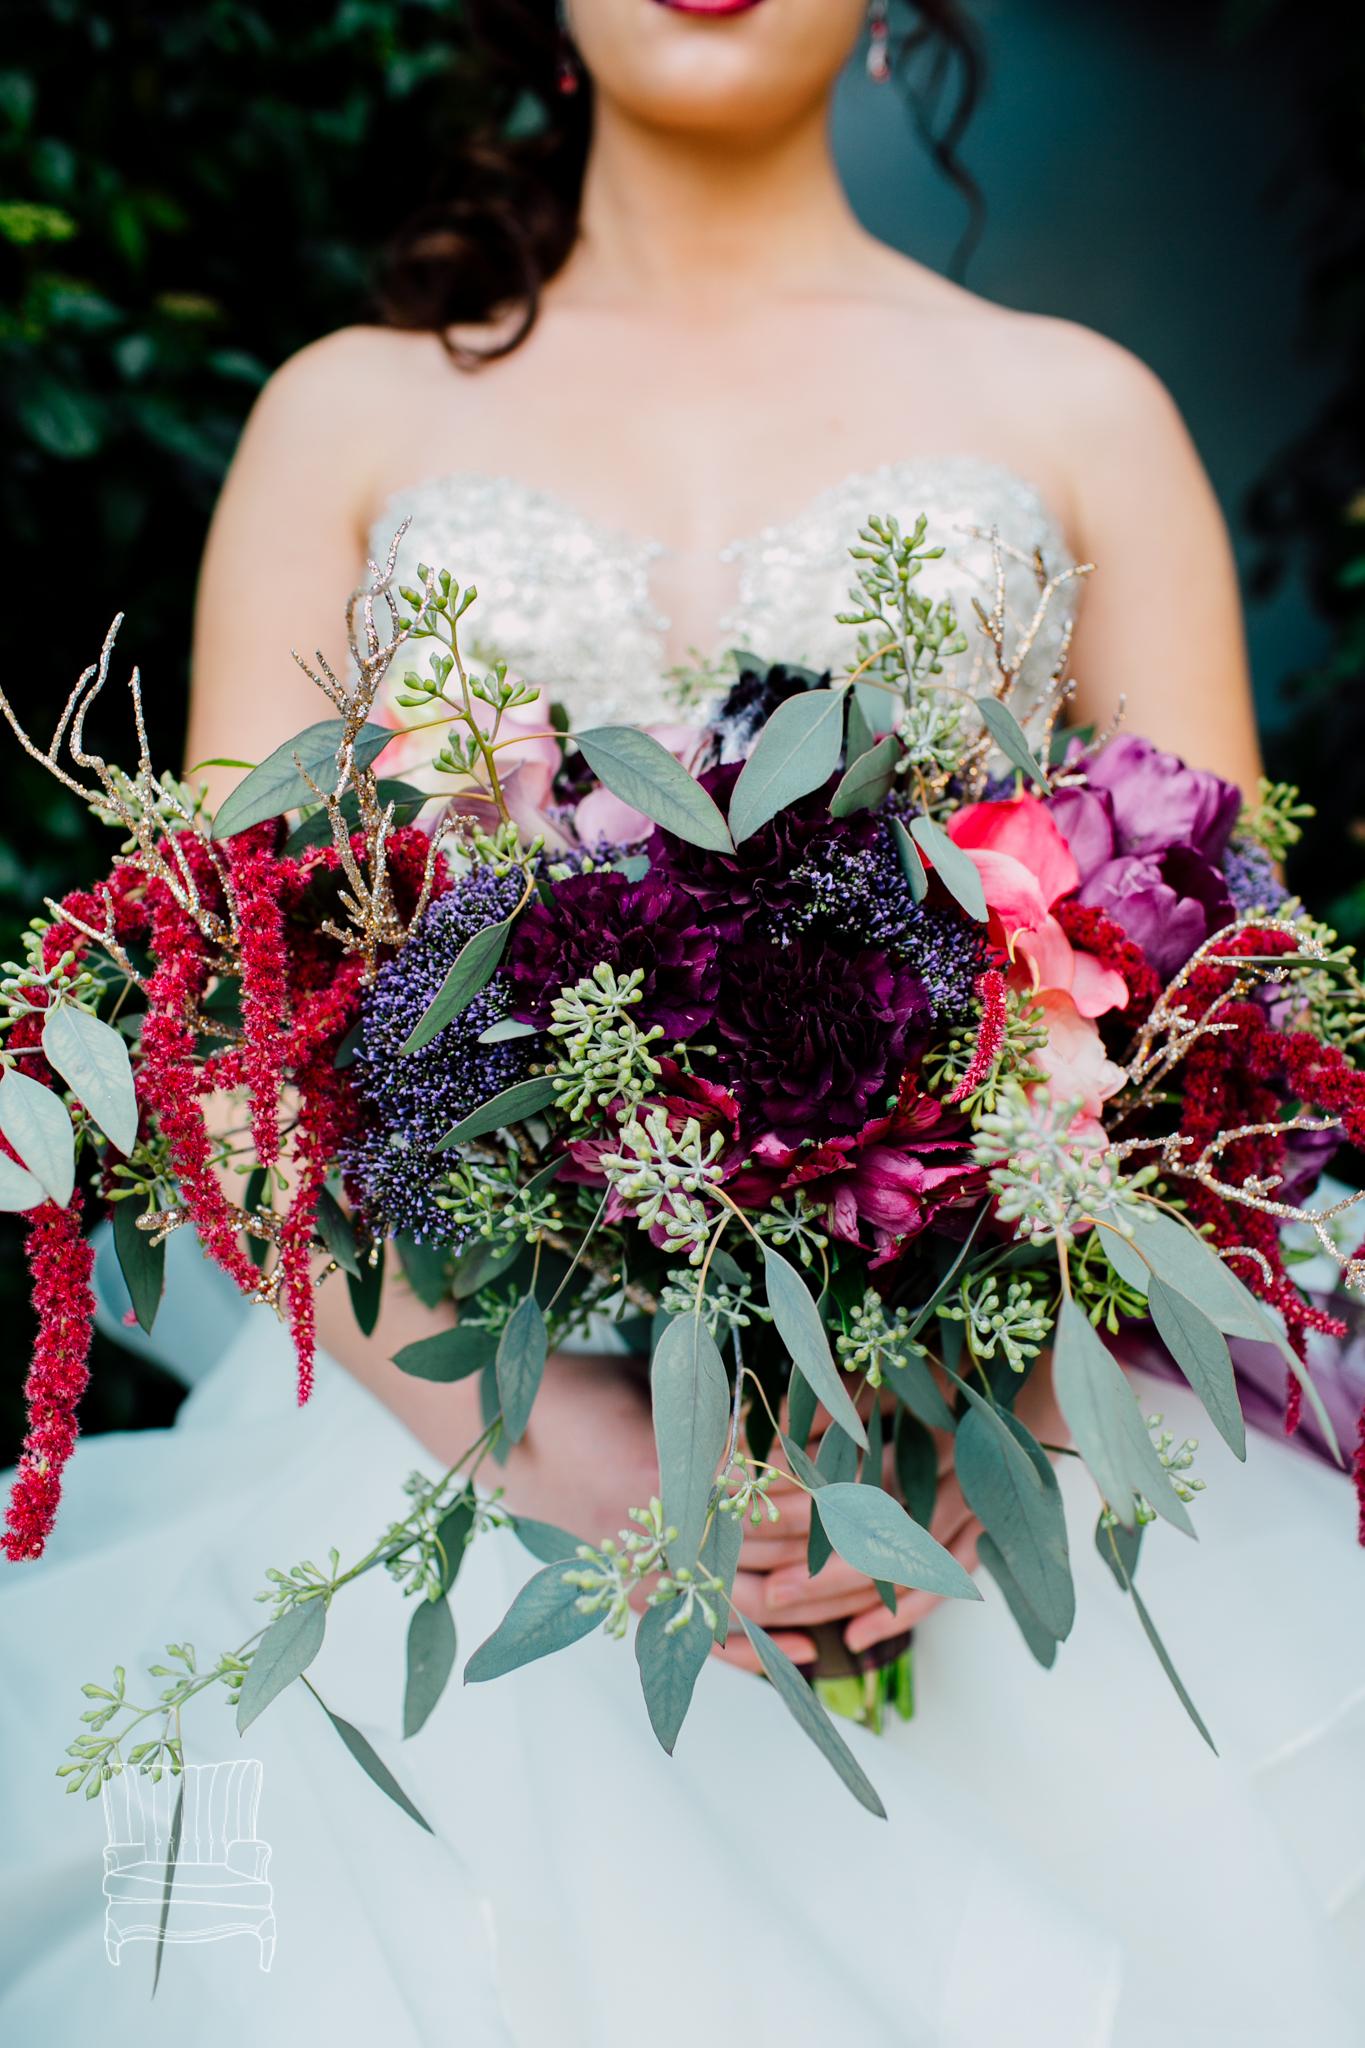 bellwether-hotel-bellingham-wedding-photographer-katheryn-moran-glitz-glam-styled-409.jpg